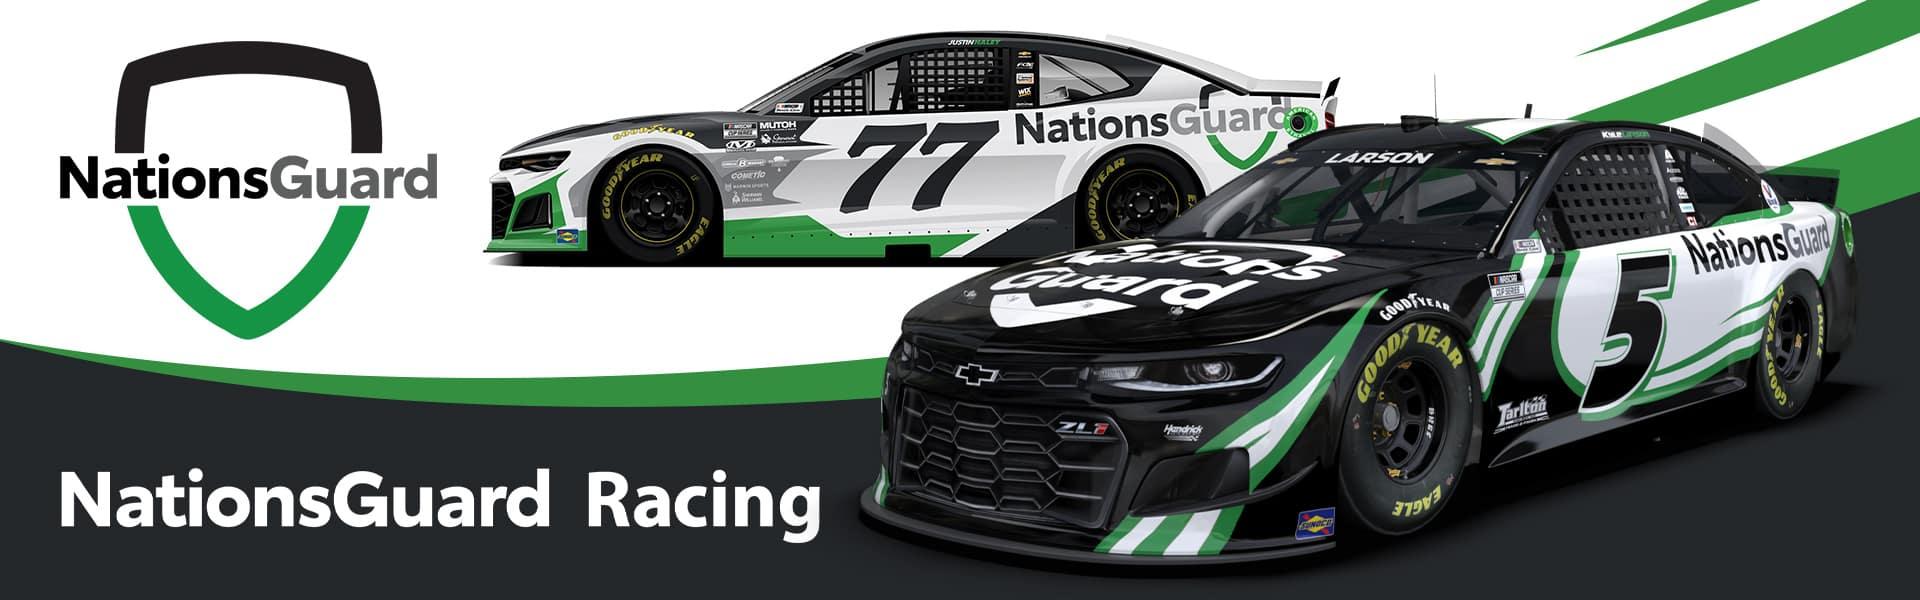 NationsGuard Racing